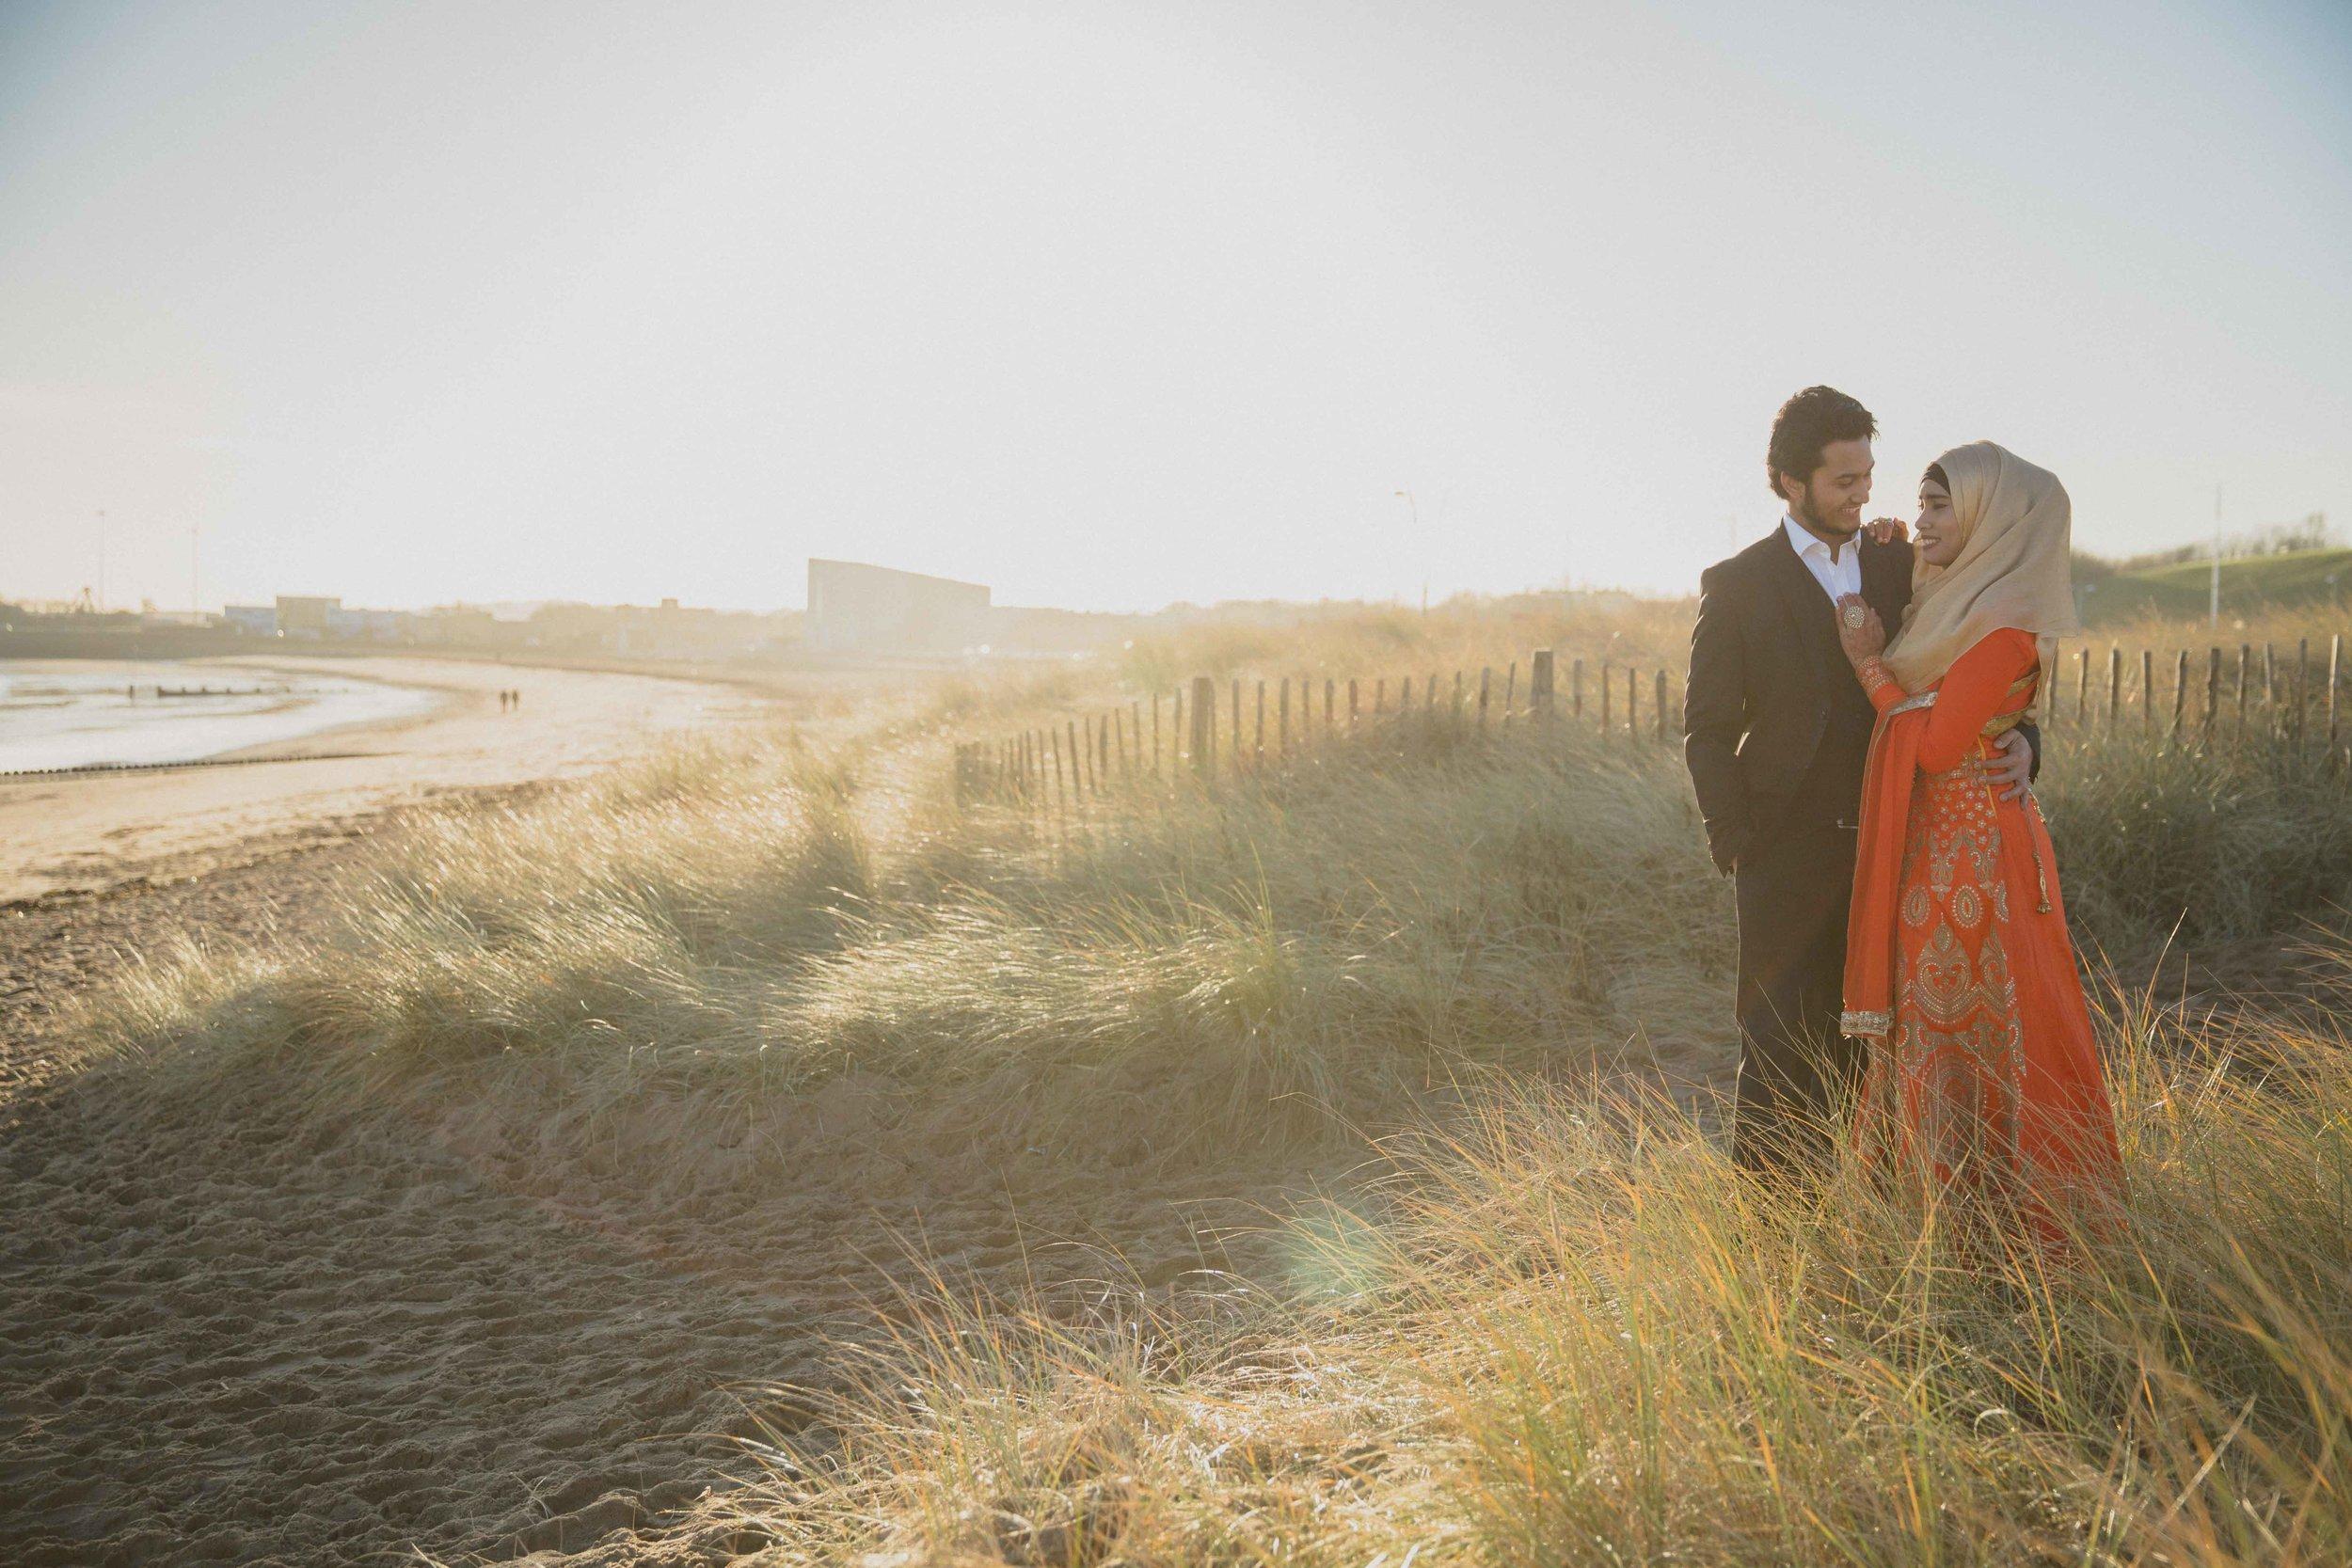 newcastle-beach-lighthouse-couple-prewedding-pre-wedding-shoot-asian-wedding-photographer-natalia-smith-photography-9.jpg